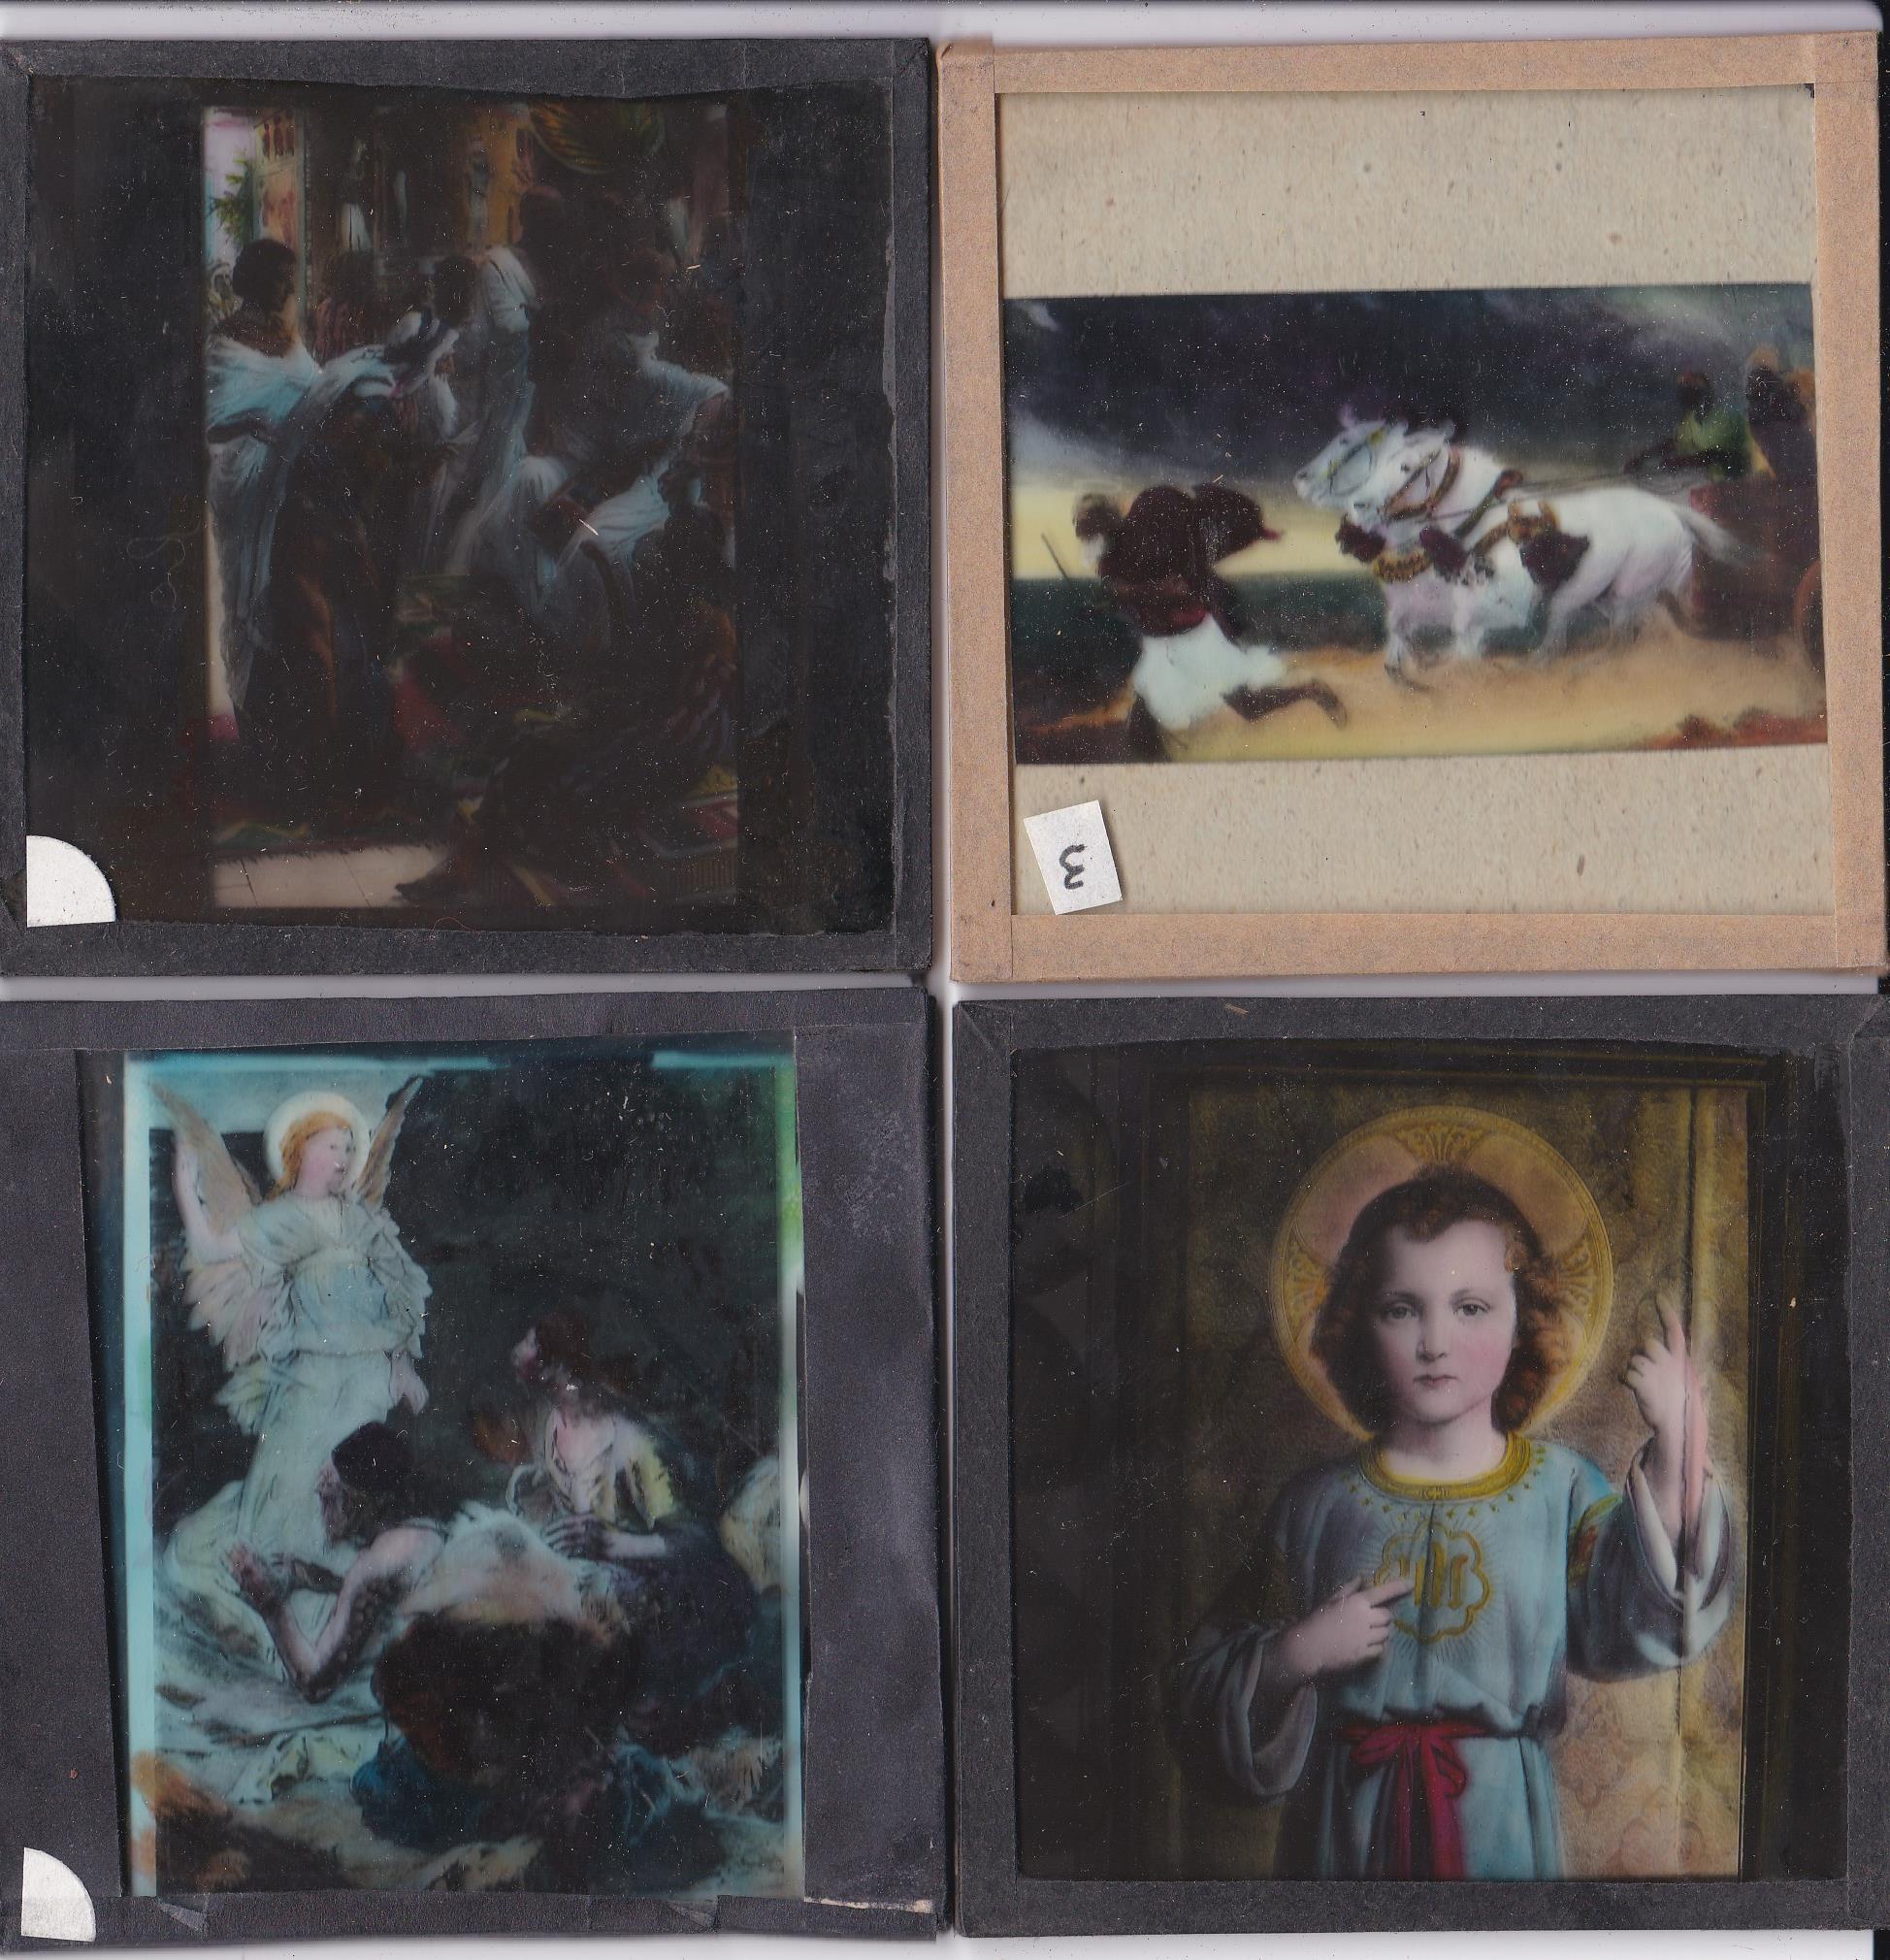 Religious Magic Lantern Slides (12) colour slides including: Joseph's Father in Egypt, Moses, The